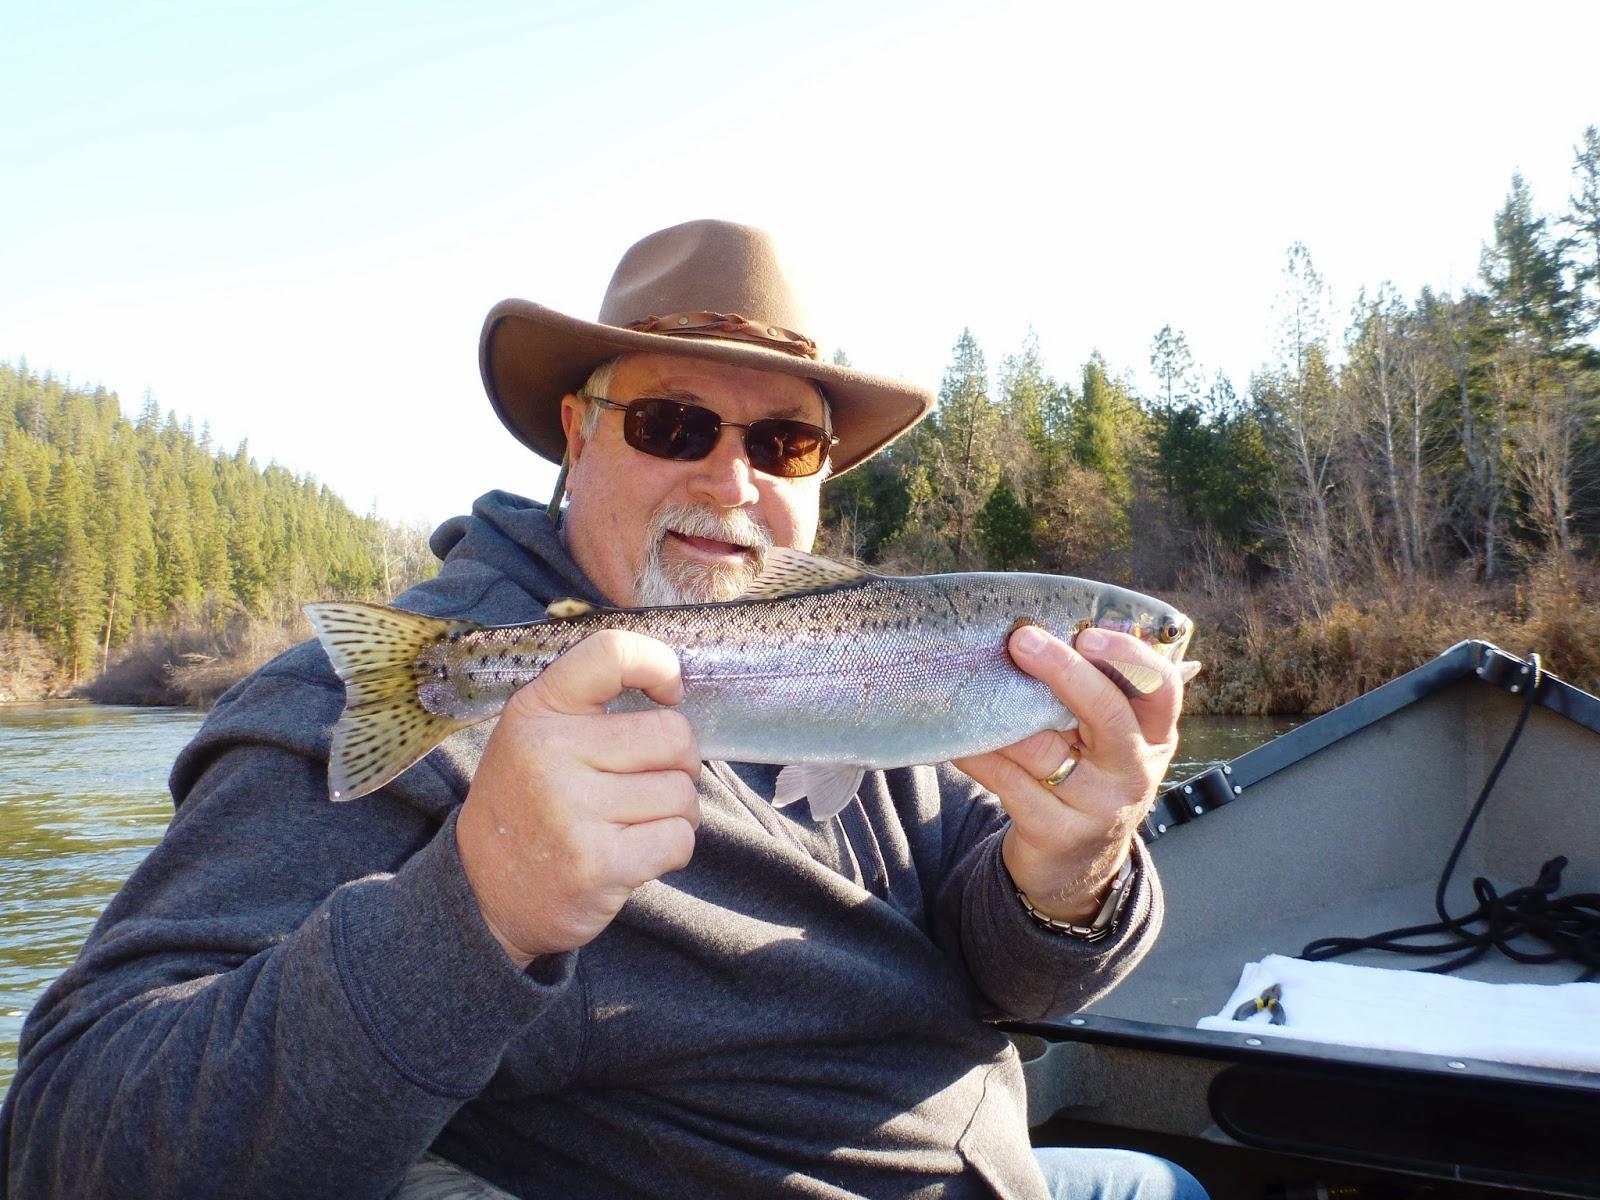 Steelhead fishing on the Klamath River with Ironhead Guide Service.